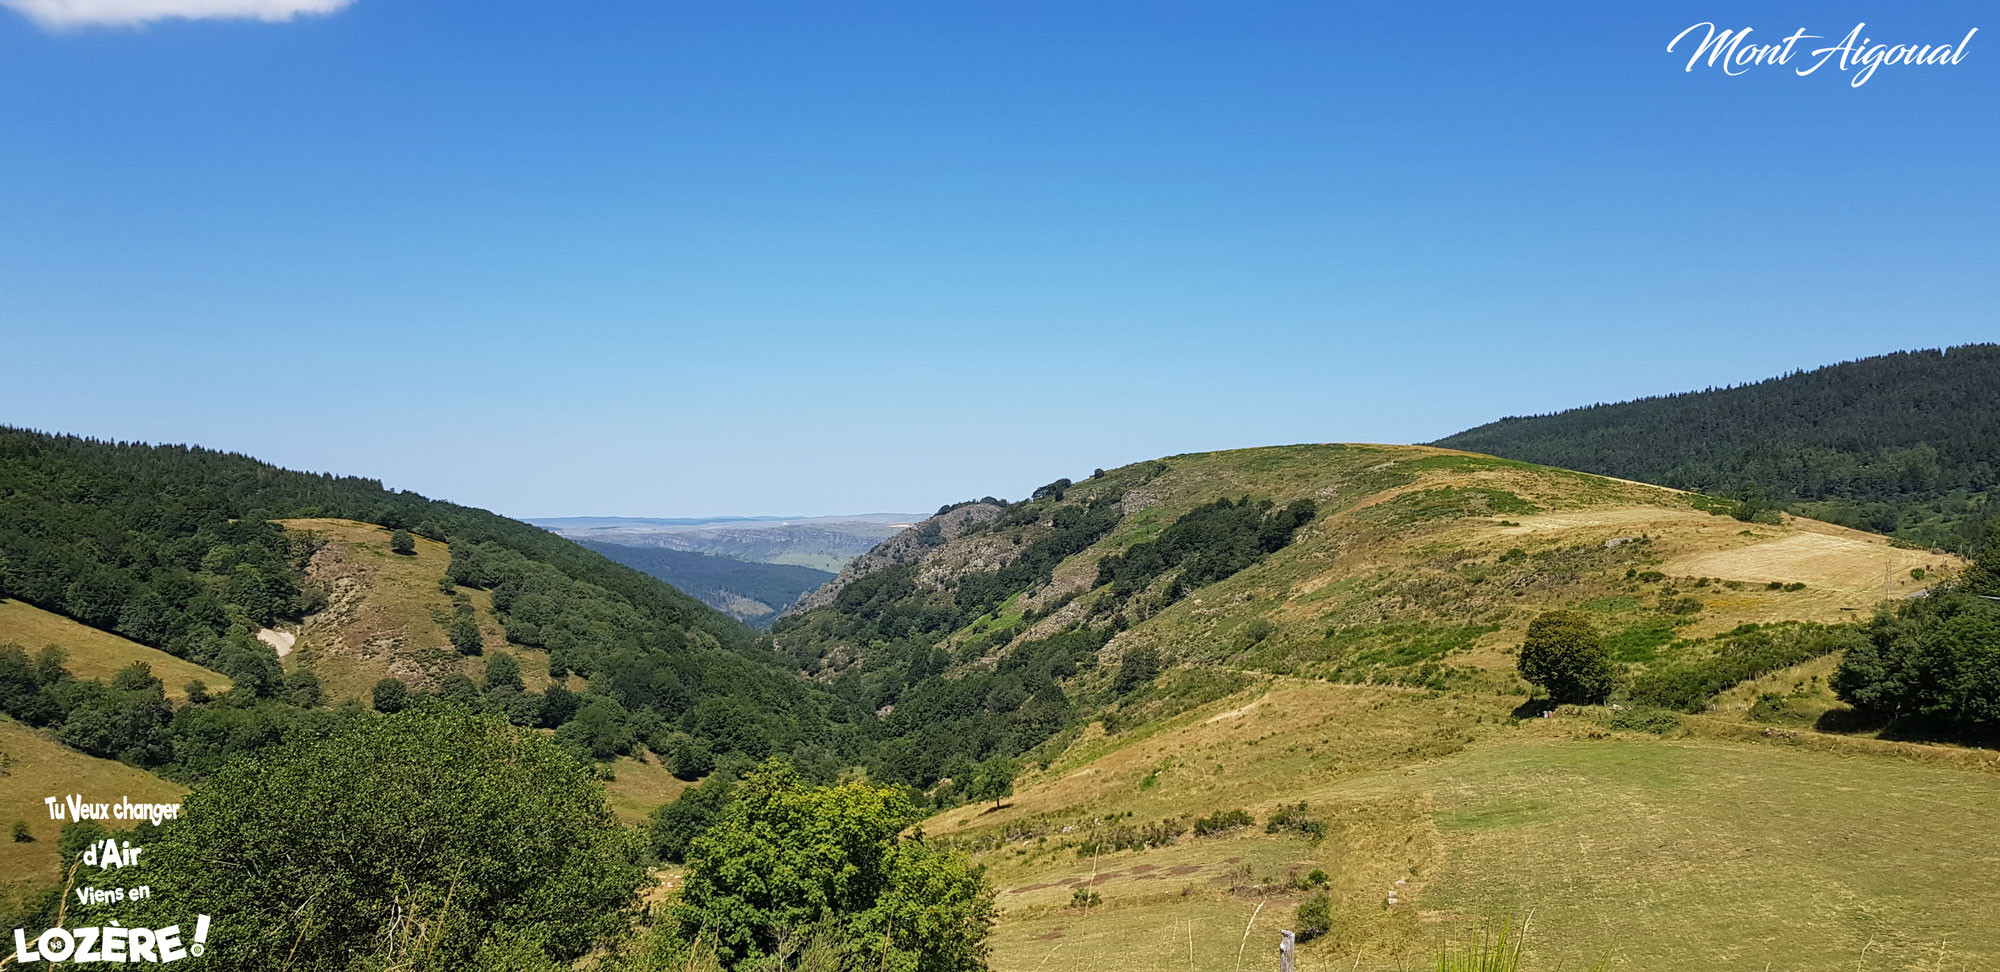 Mont-Aigoual-4.jpg